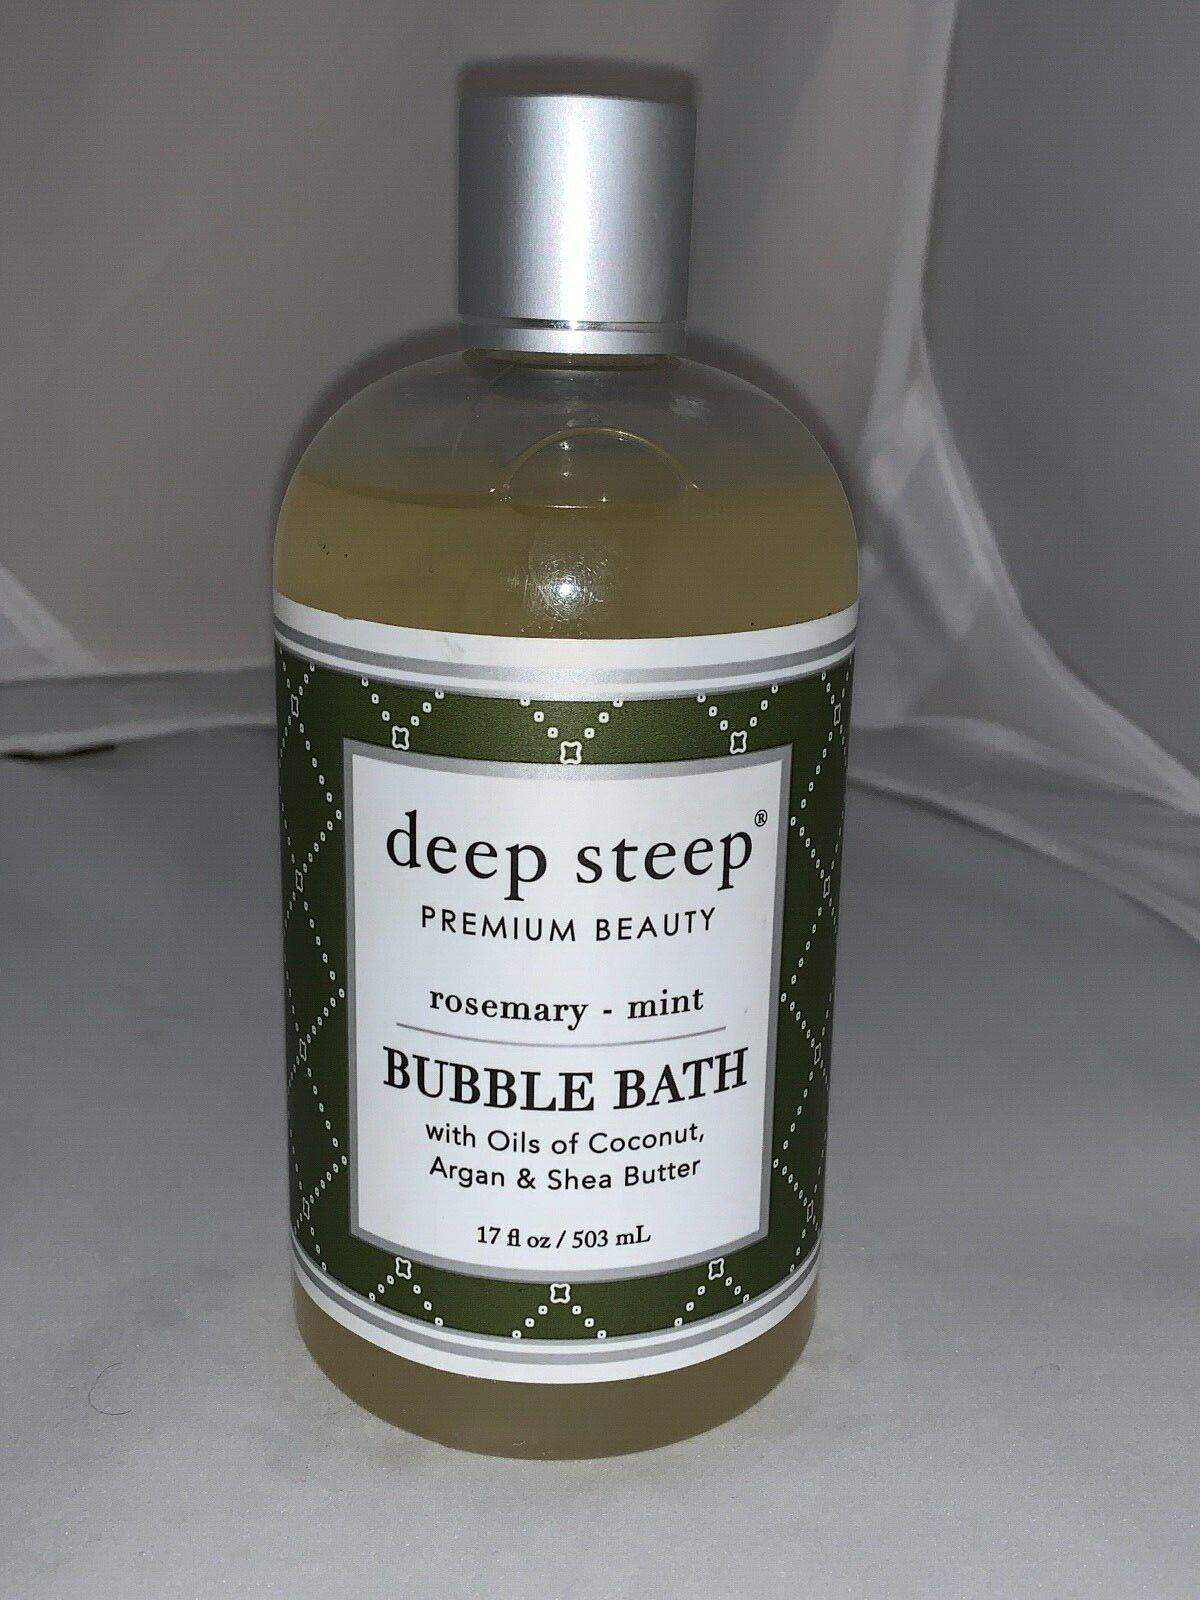 DEEP STEEP BUBBLE BATH,RSMRY MINT, 17 FZ, EA-1